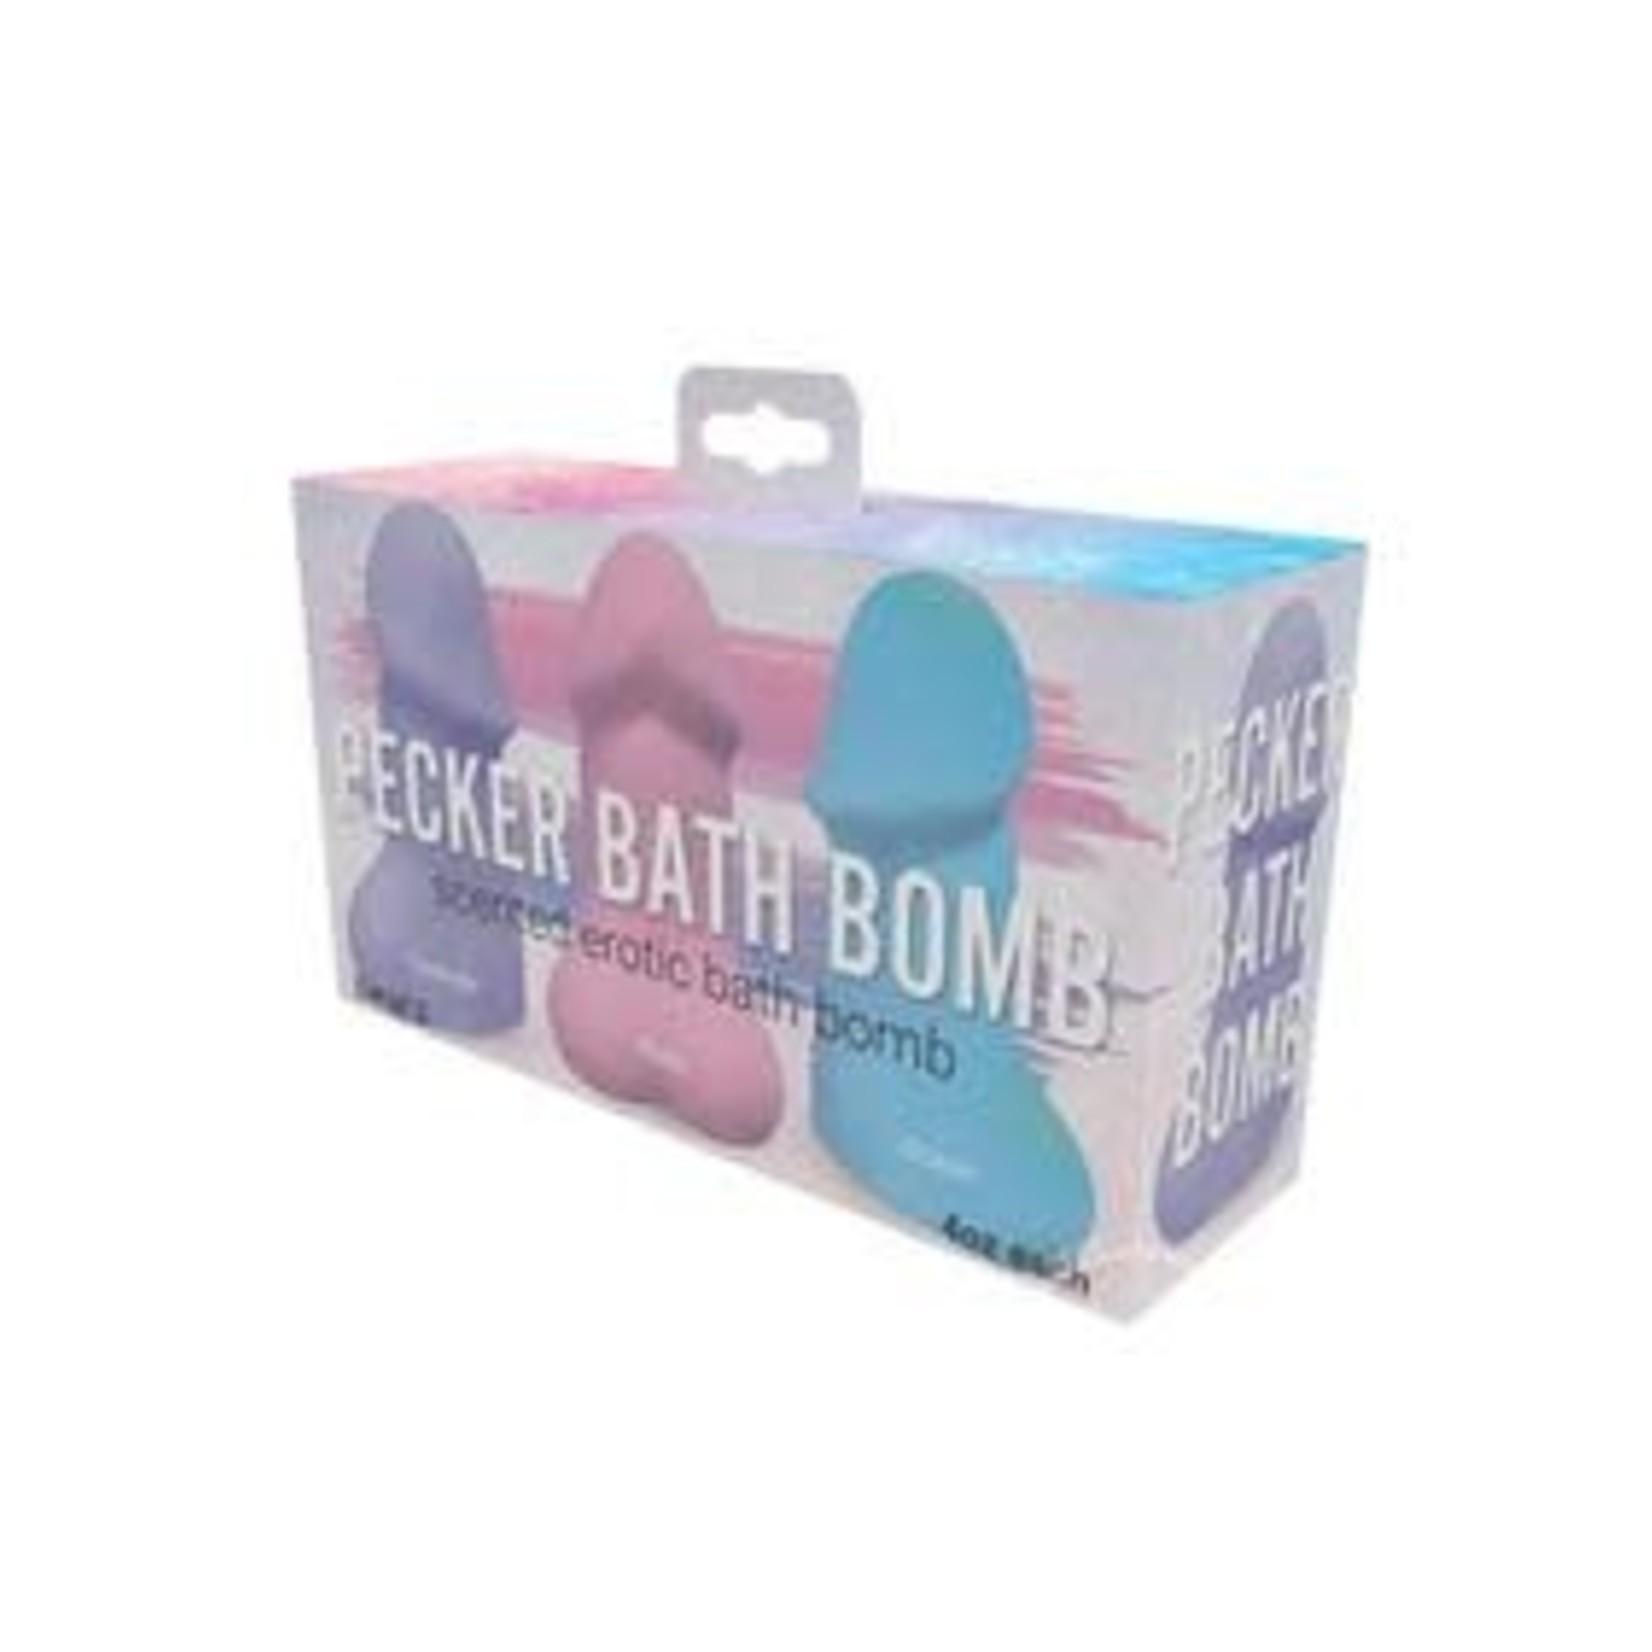 Pecker Bath Bomb-Jasmine Pack of 3